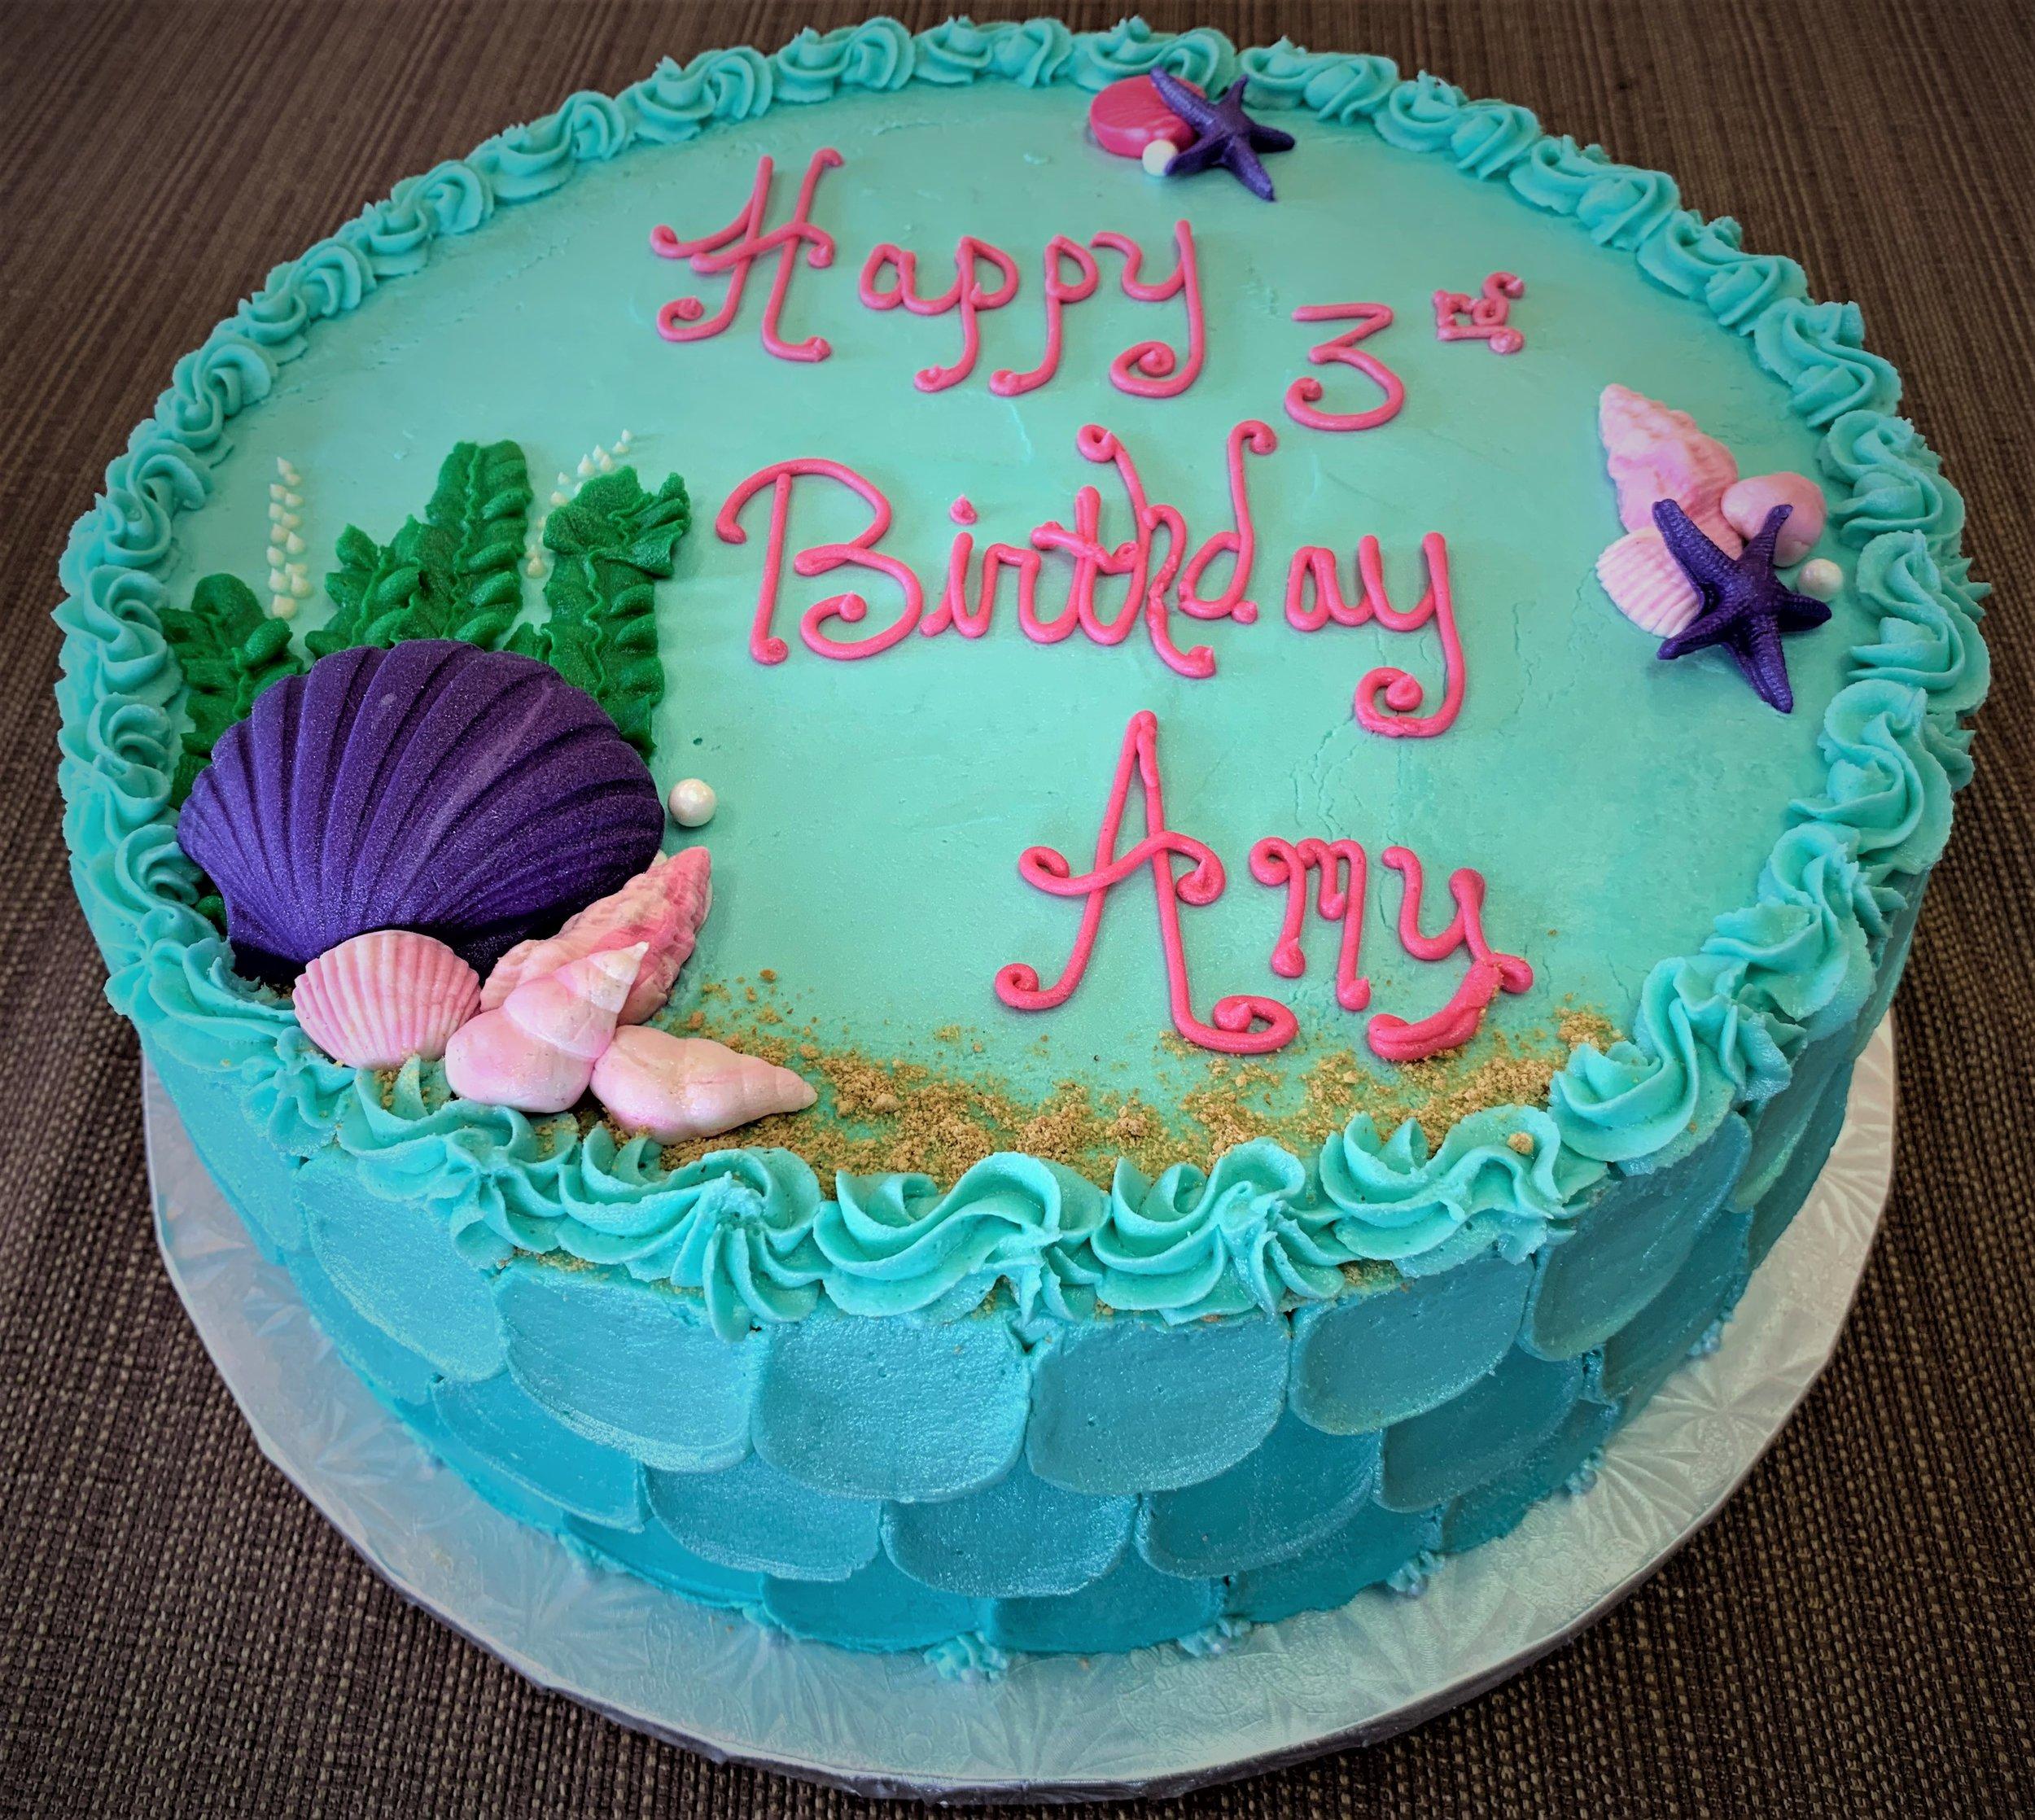 Gateaux Bakery & Cafe Beautiful Seashell Birthday Cake 4.6.19.jpeg